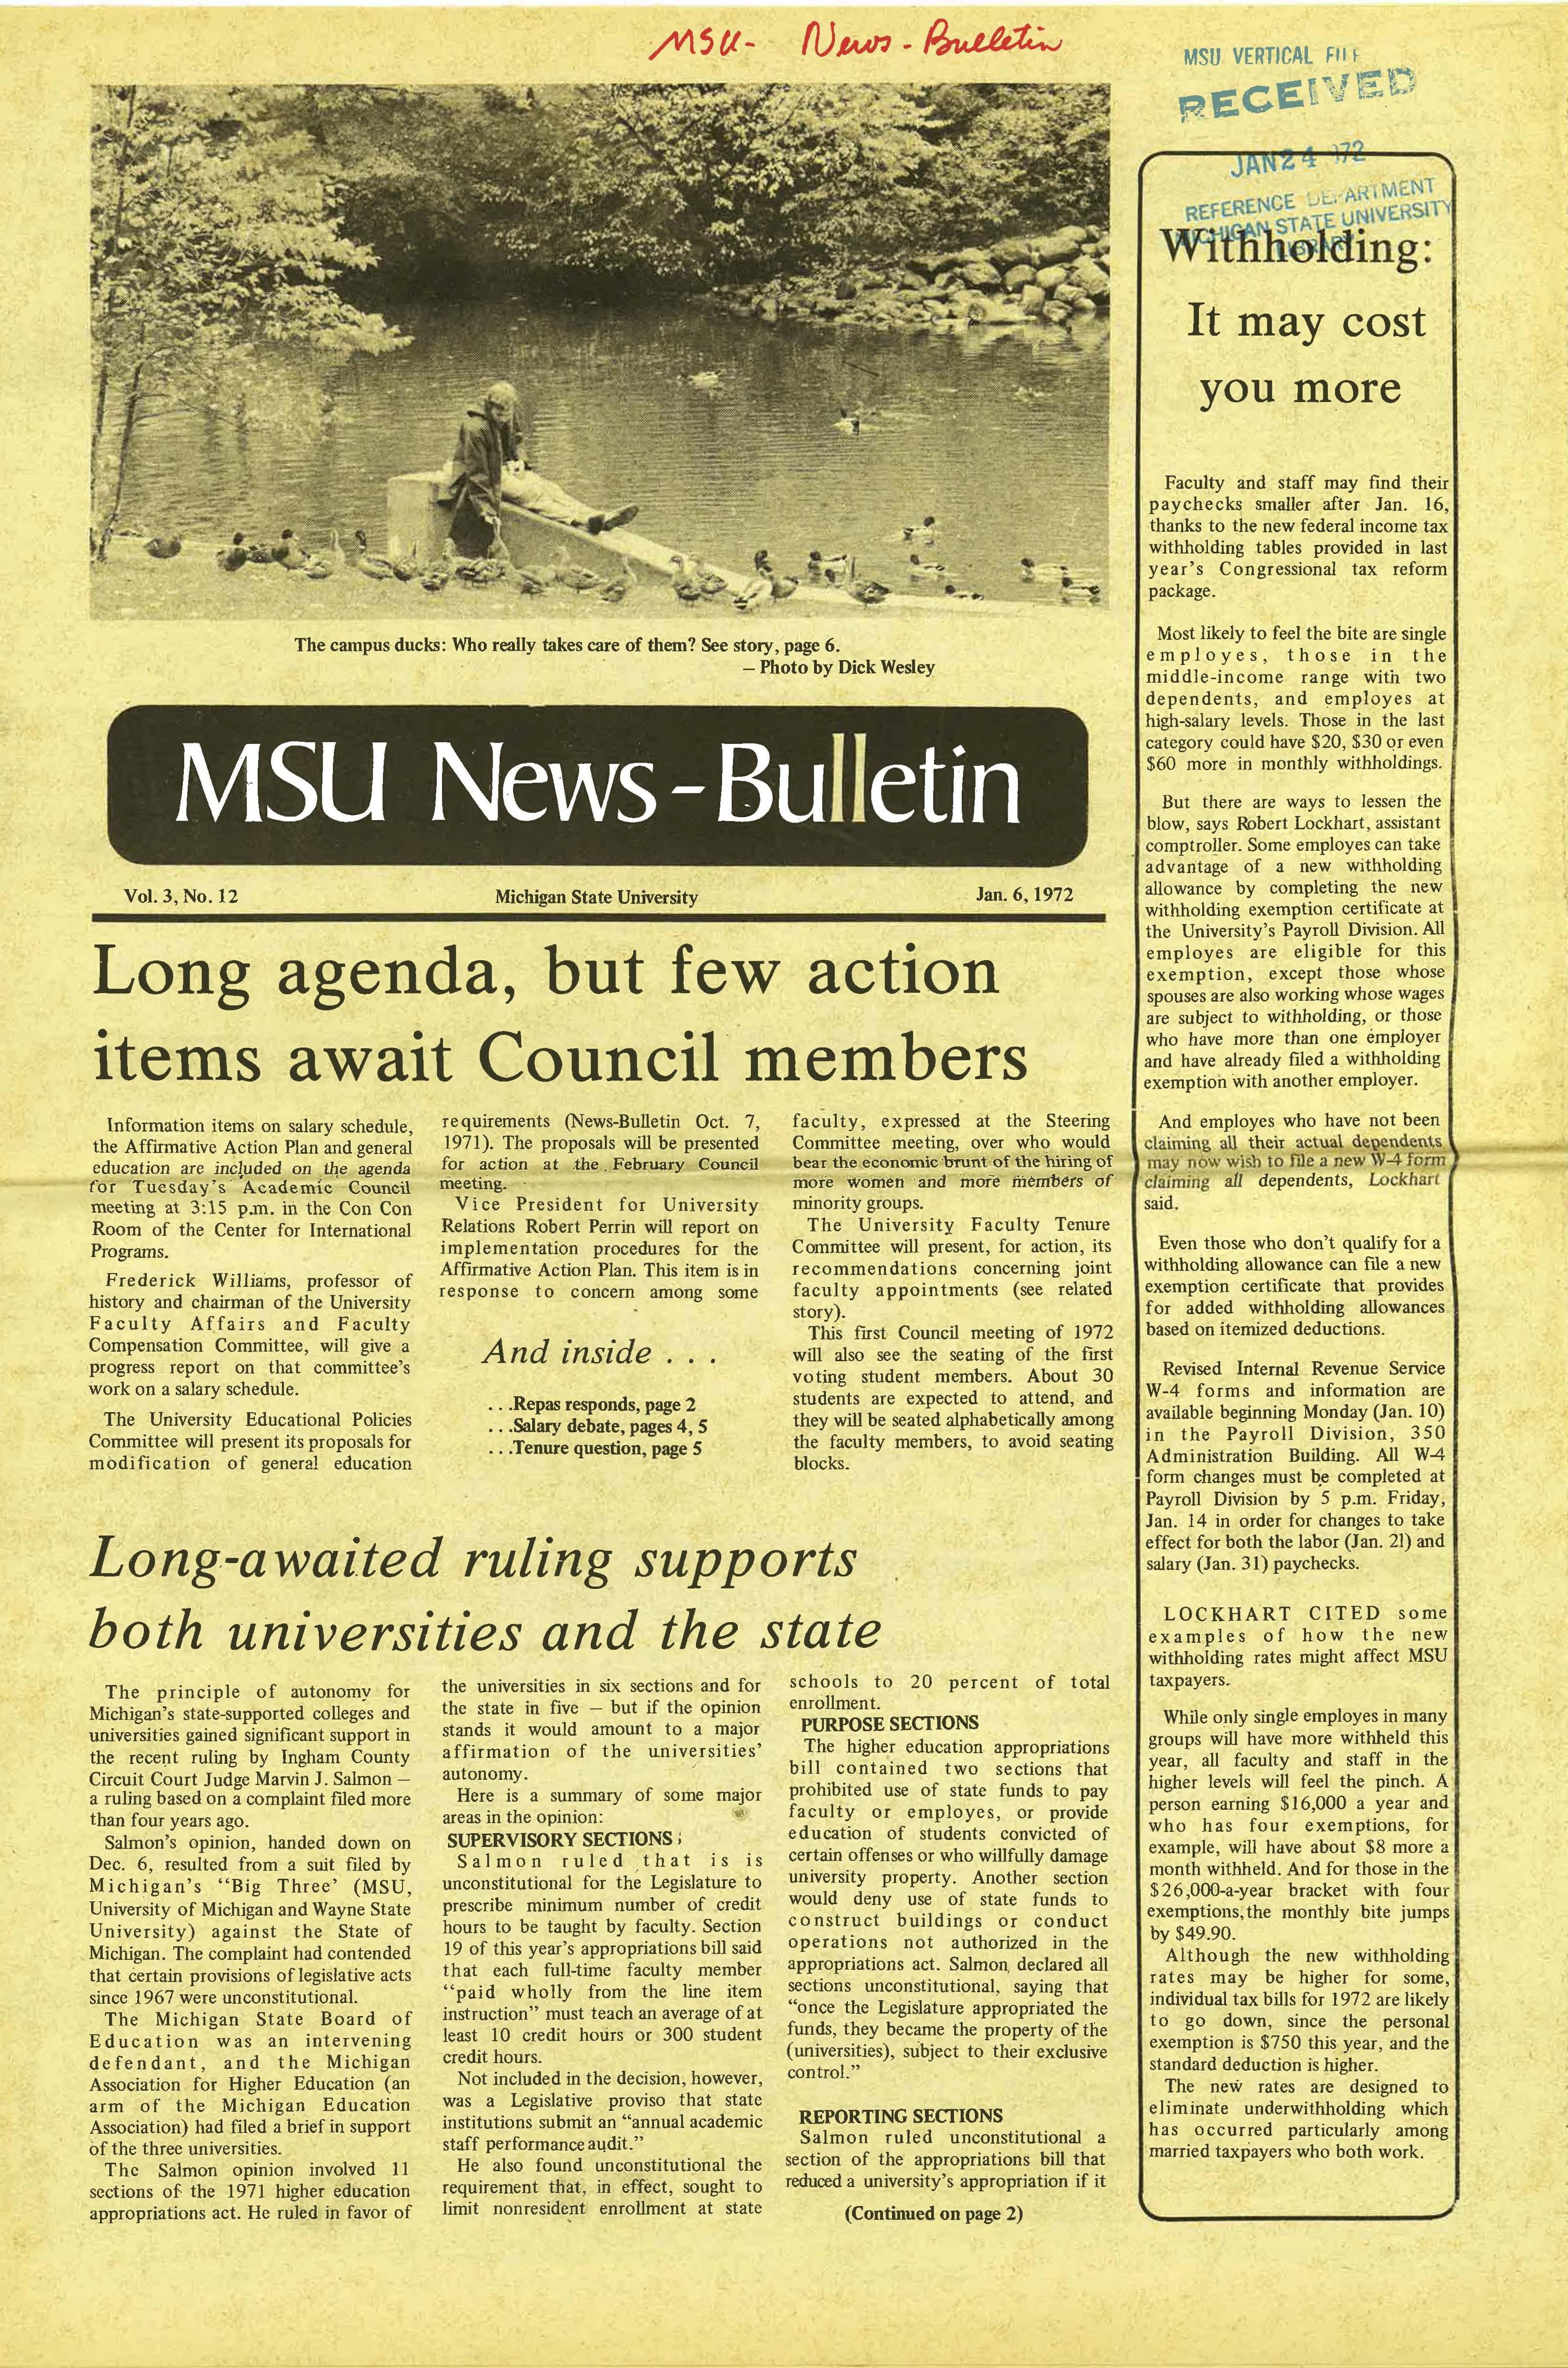 MSU News Bulletin, vol. 3, No. 12, January 6, 1972